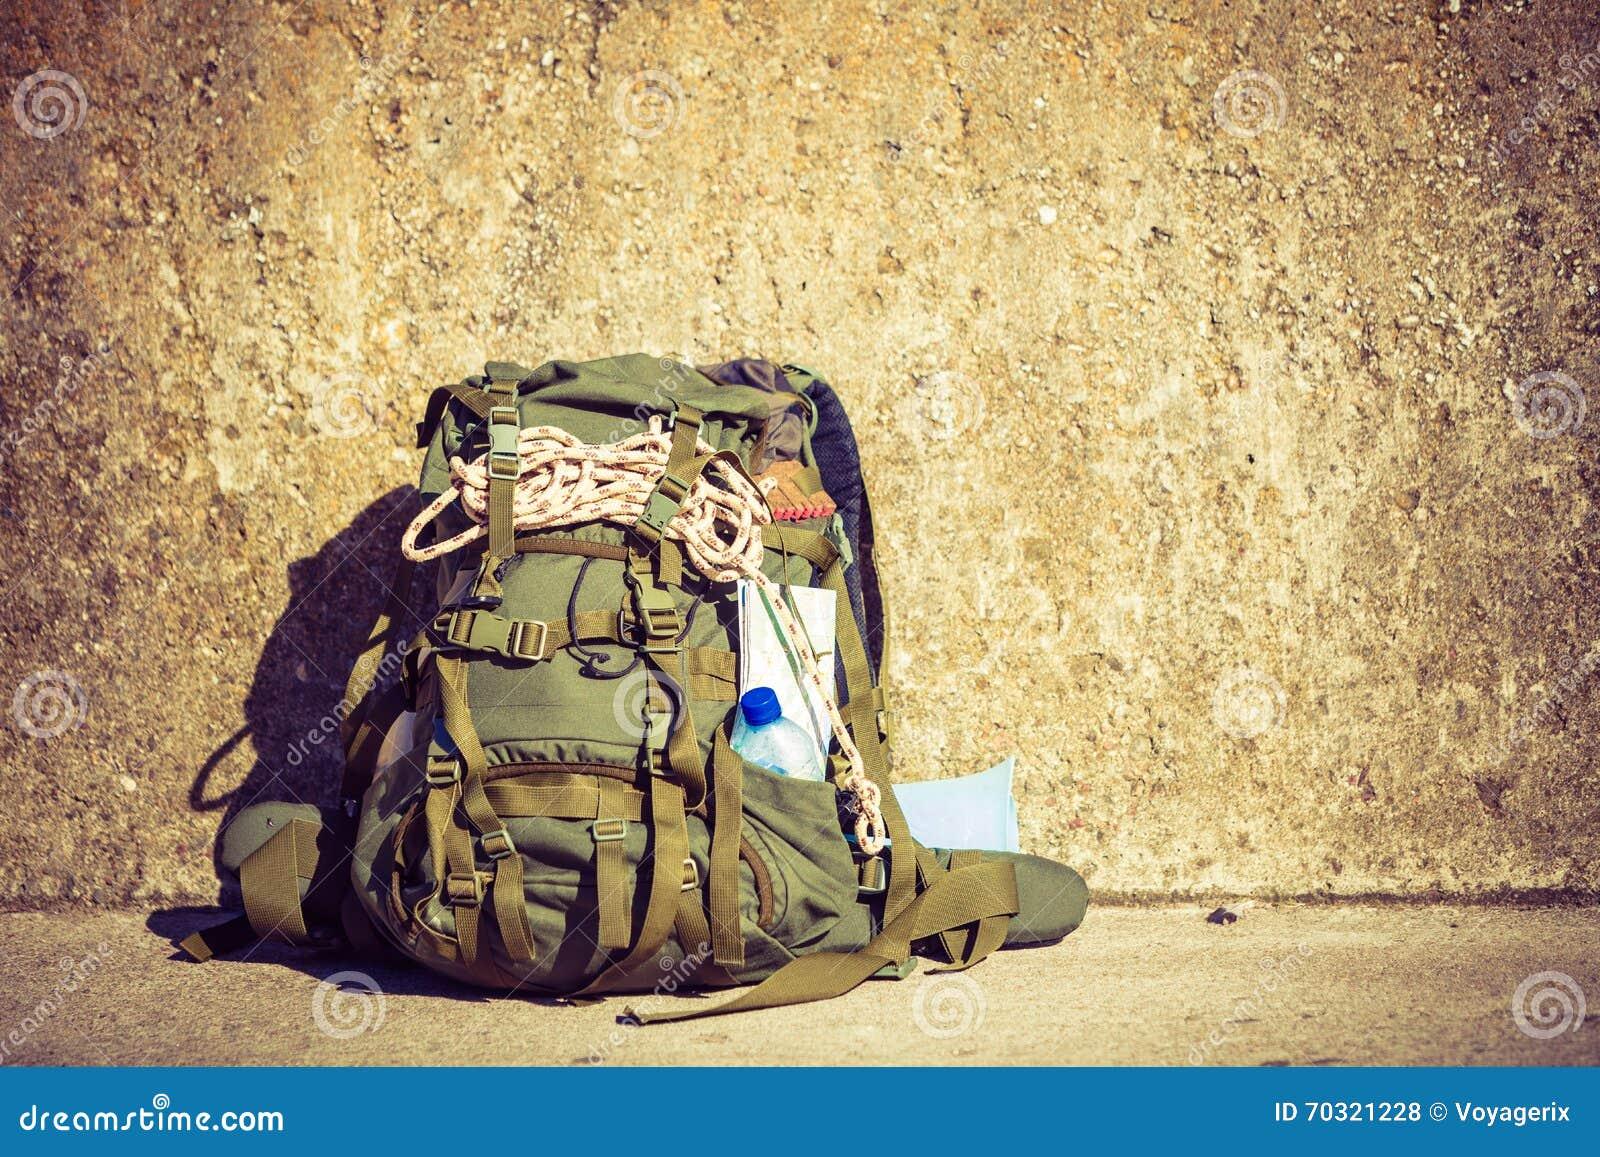 badce8c85f Εξοπλισμός στρατοπέδευσης σακιδίων πλάτης πεζοπορίας υπαίθριος στον τοίχο  grunge